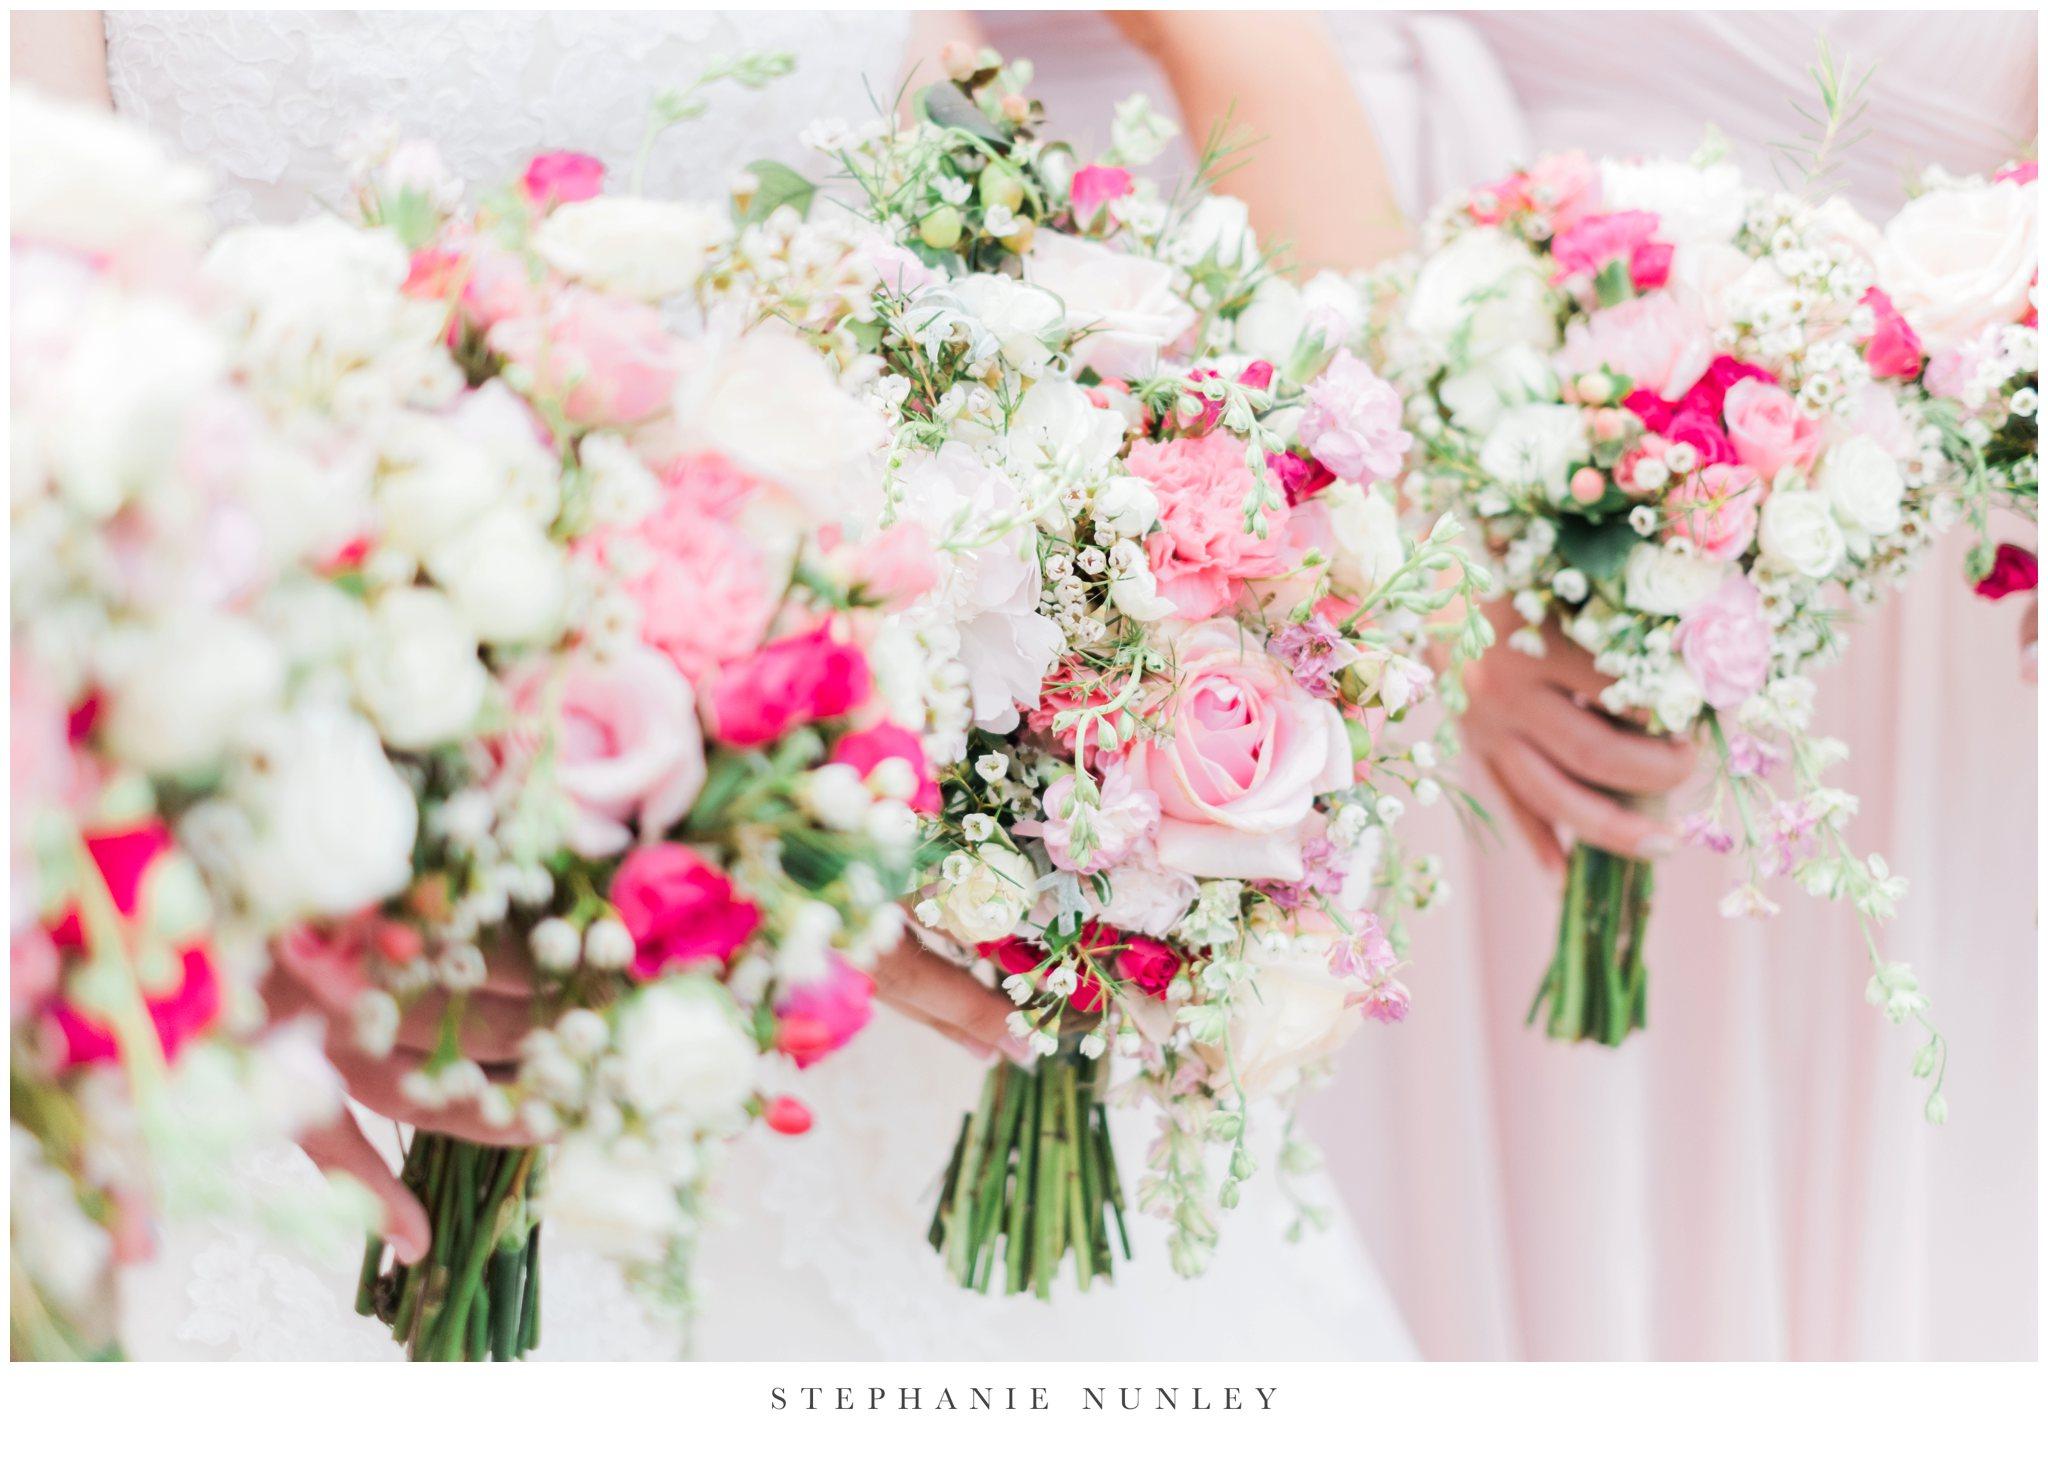 romantic-outdoor-wedding-with-flower-crown-0081.jpg